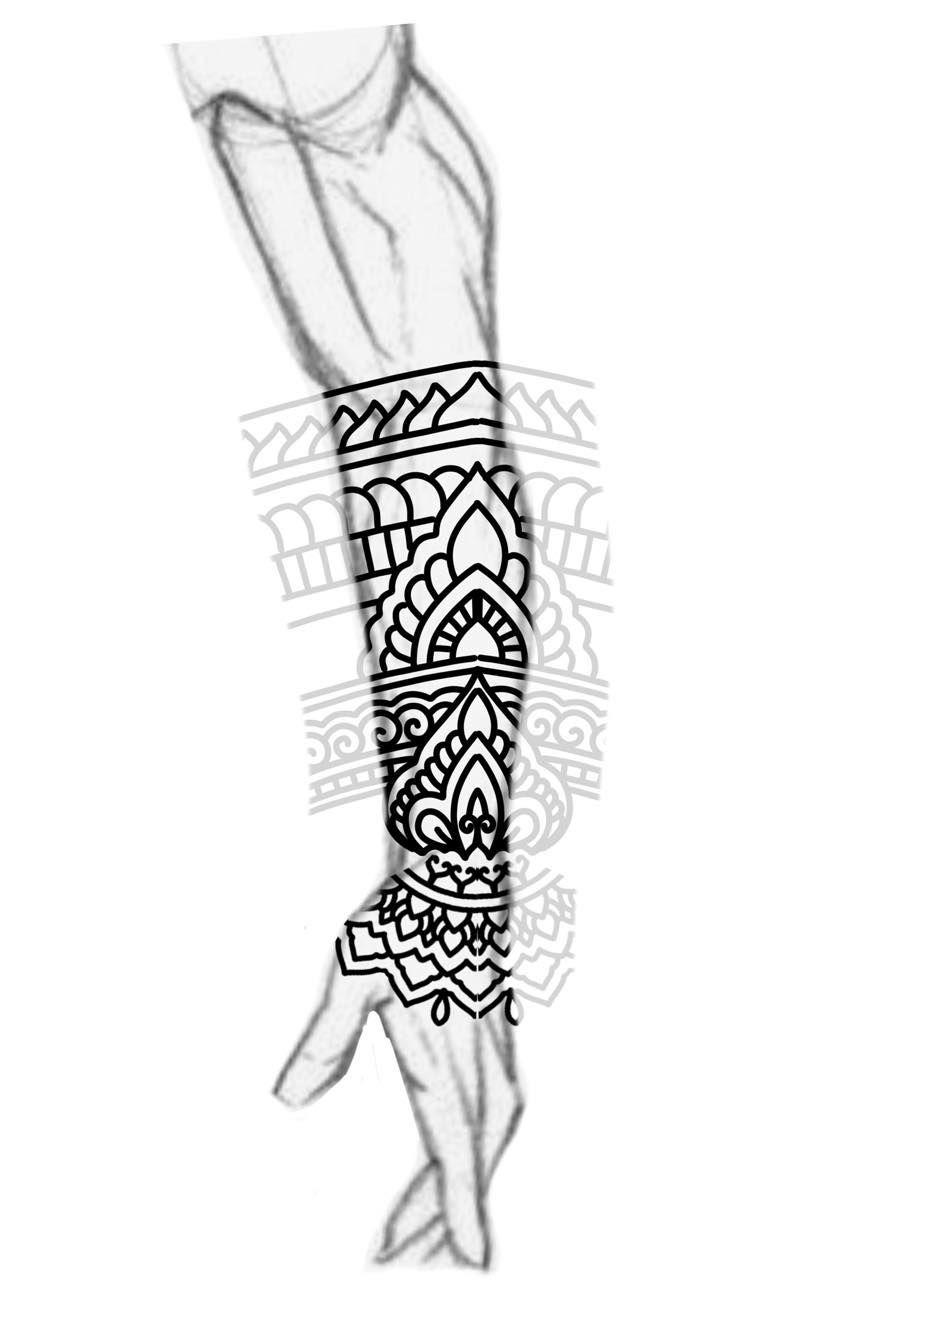 Bra clipart forearm. Blackwork sleeve mandala ornamental